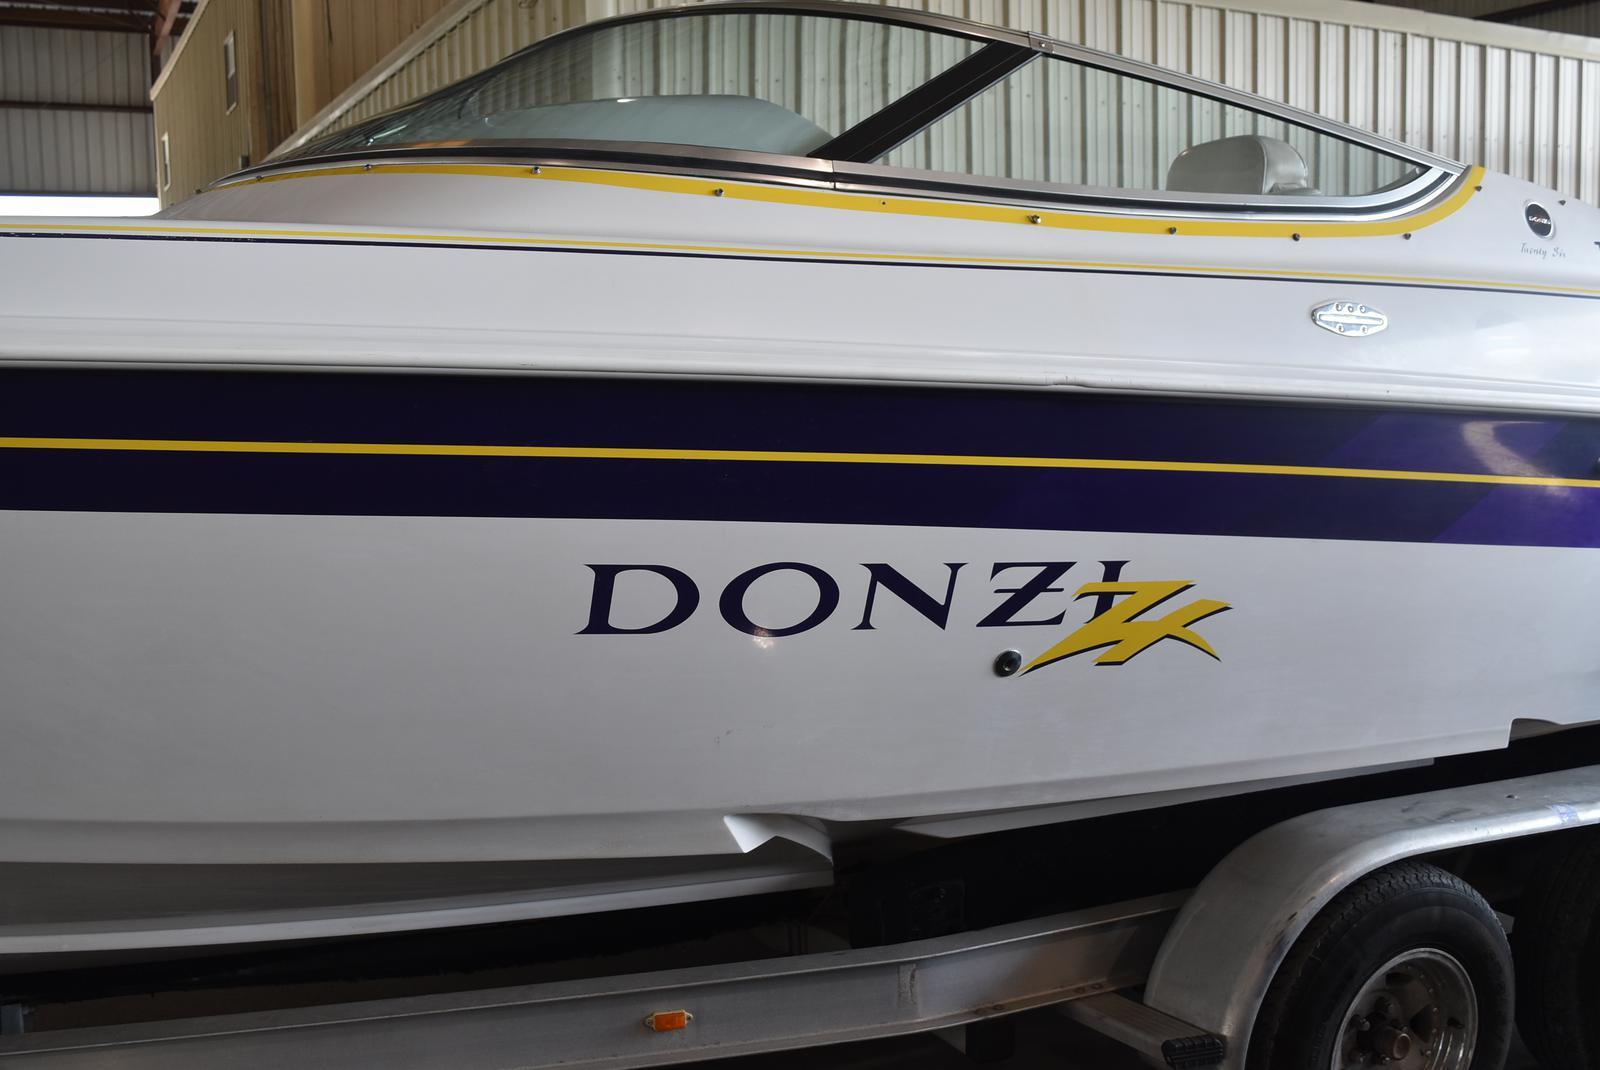 1999 Donzi 26 ZX